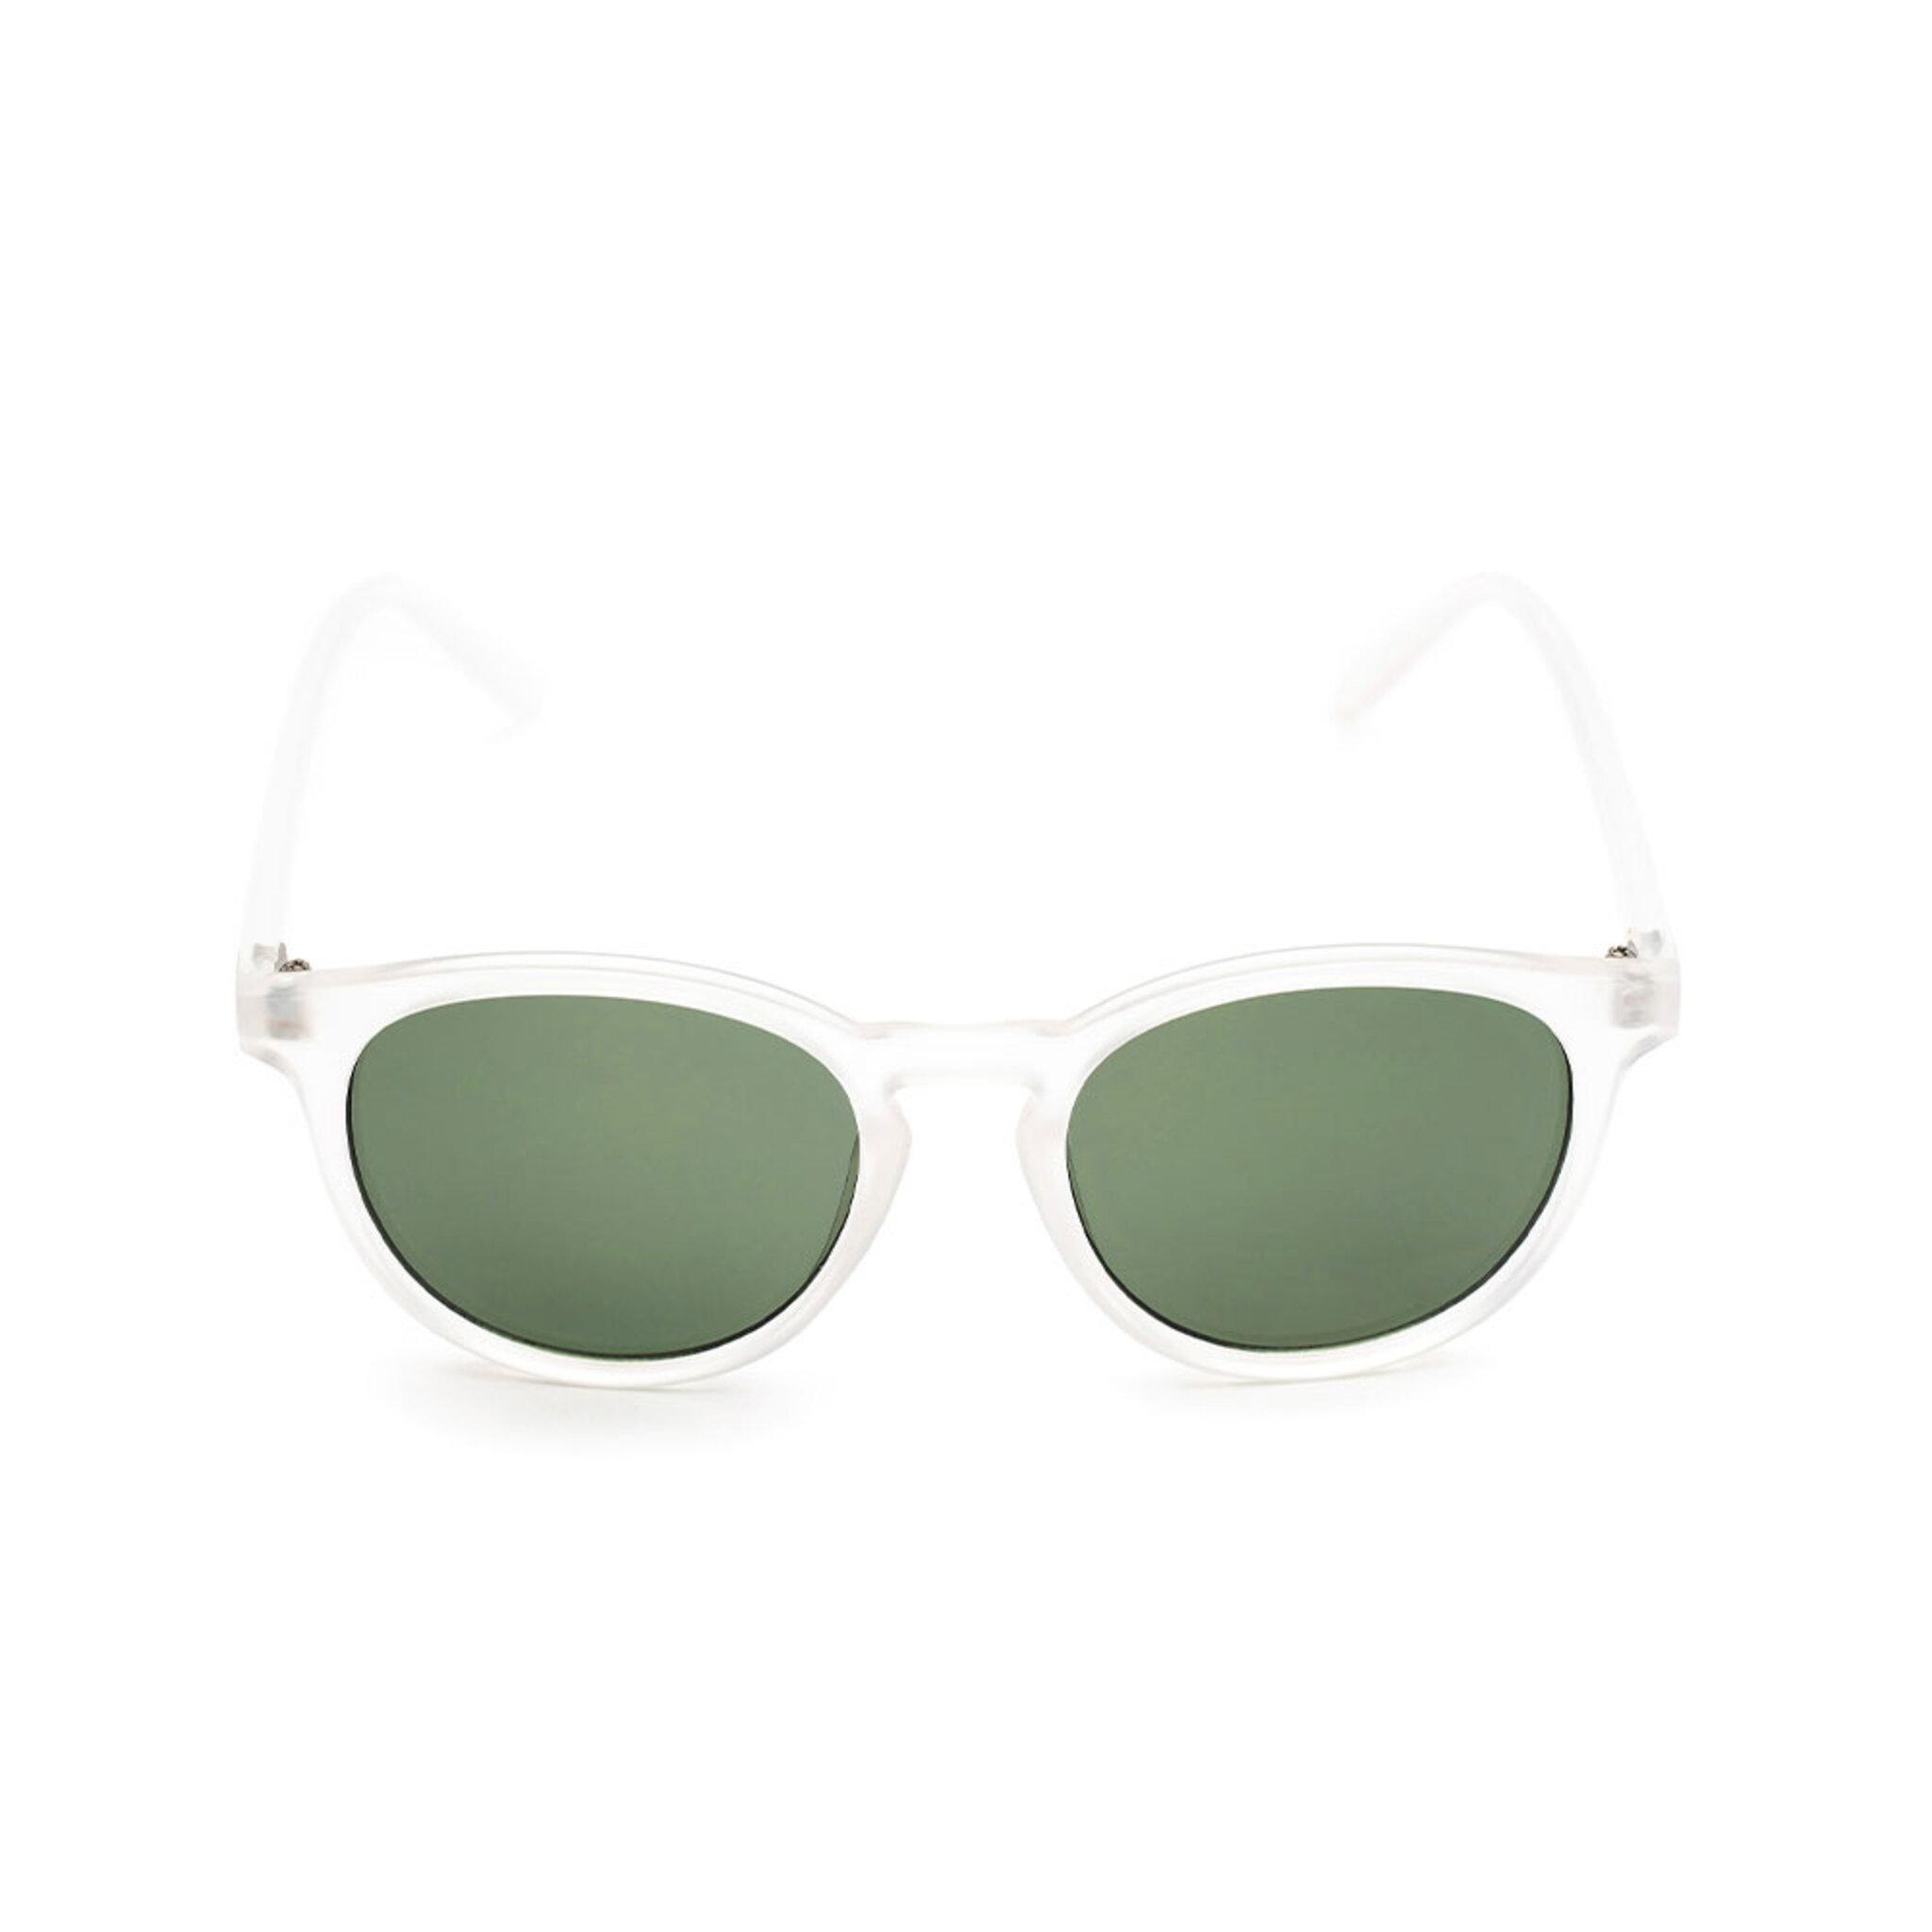 Ivy solglasögon, ONE SIZE